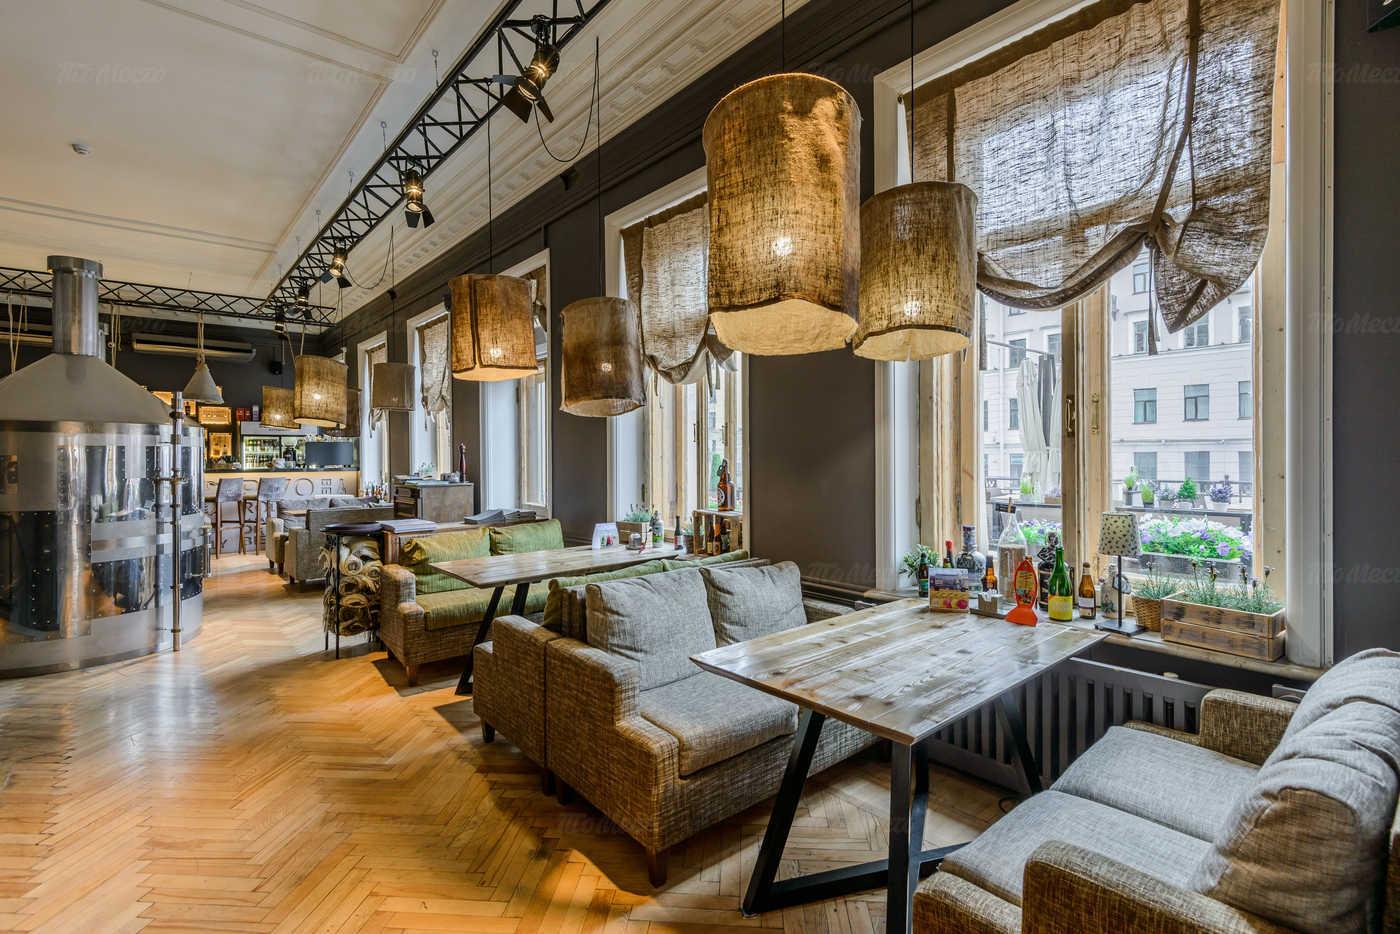 Ресторан Шато Винтаж (Chateau Vintage) на Невском проспекте фото 9